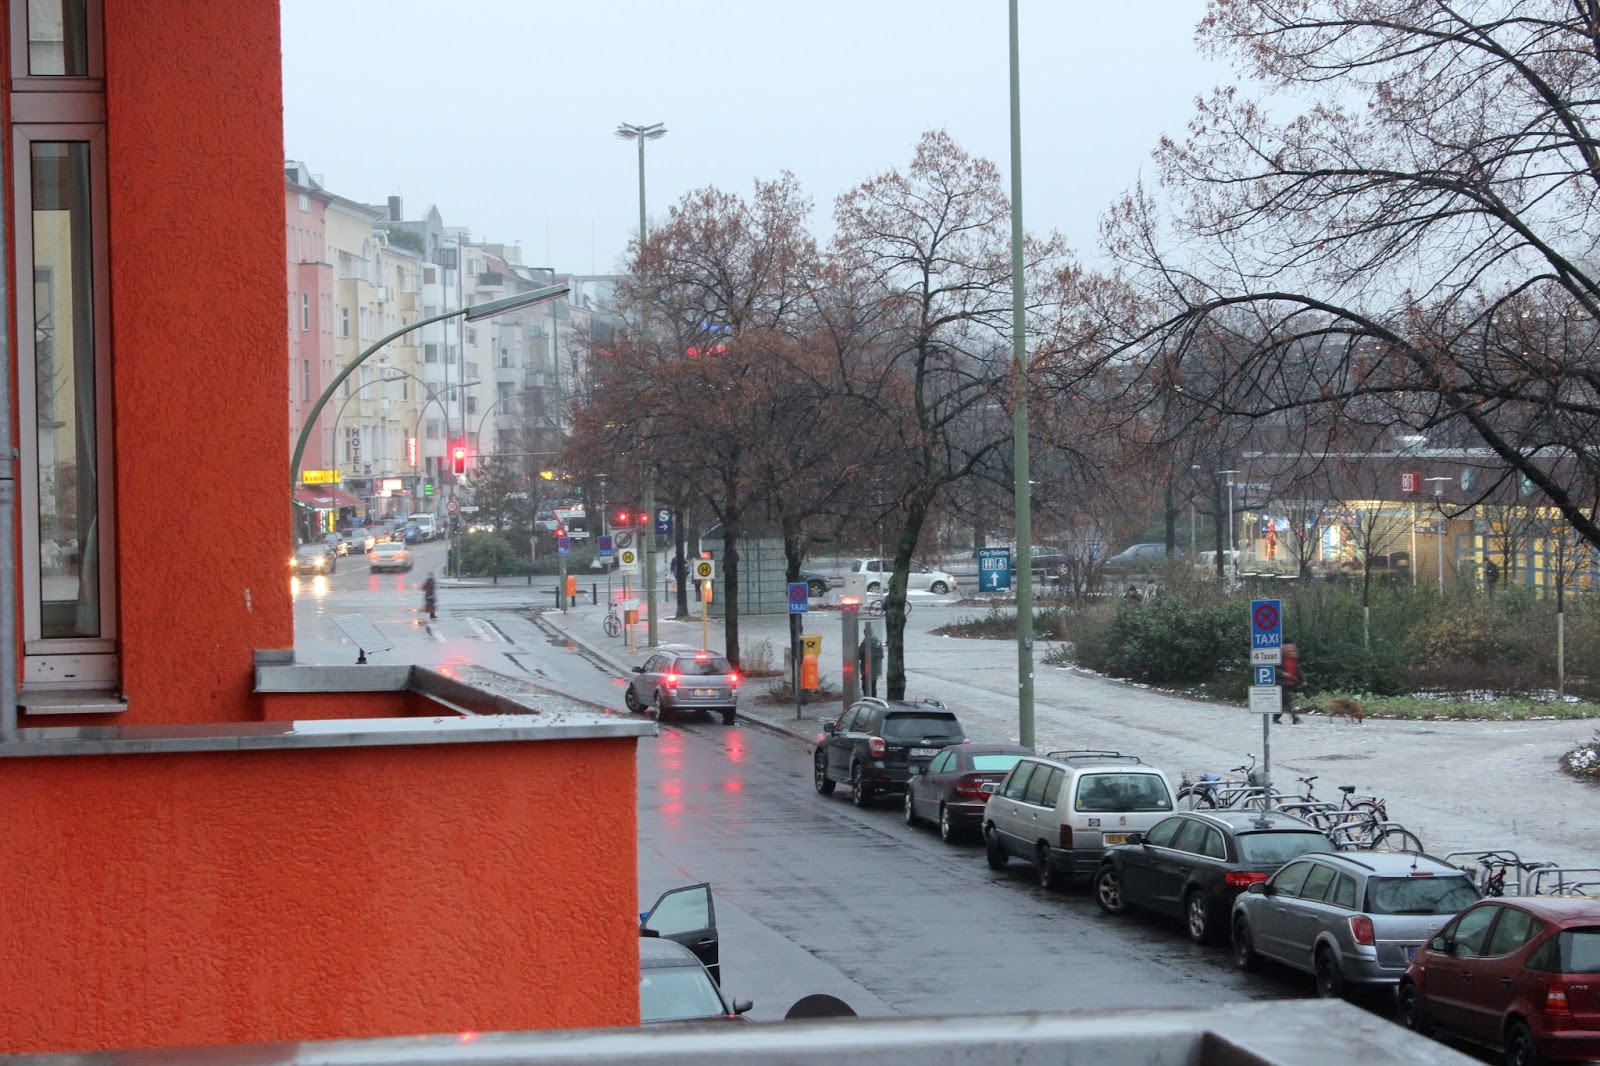 itinerary dan biaya liburan di berlin jerman-3 happy go lucky hostel charlottenburg